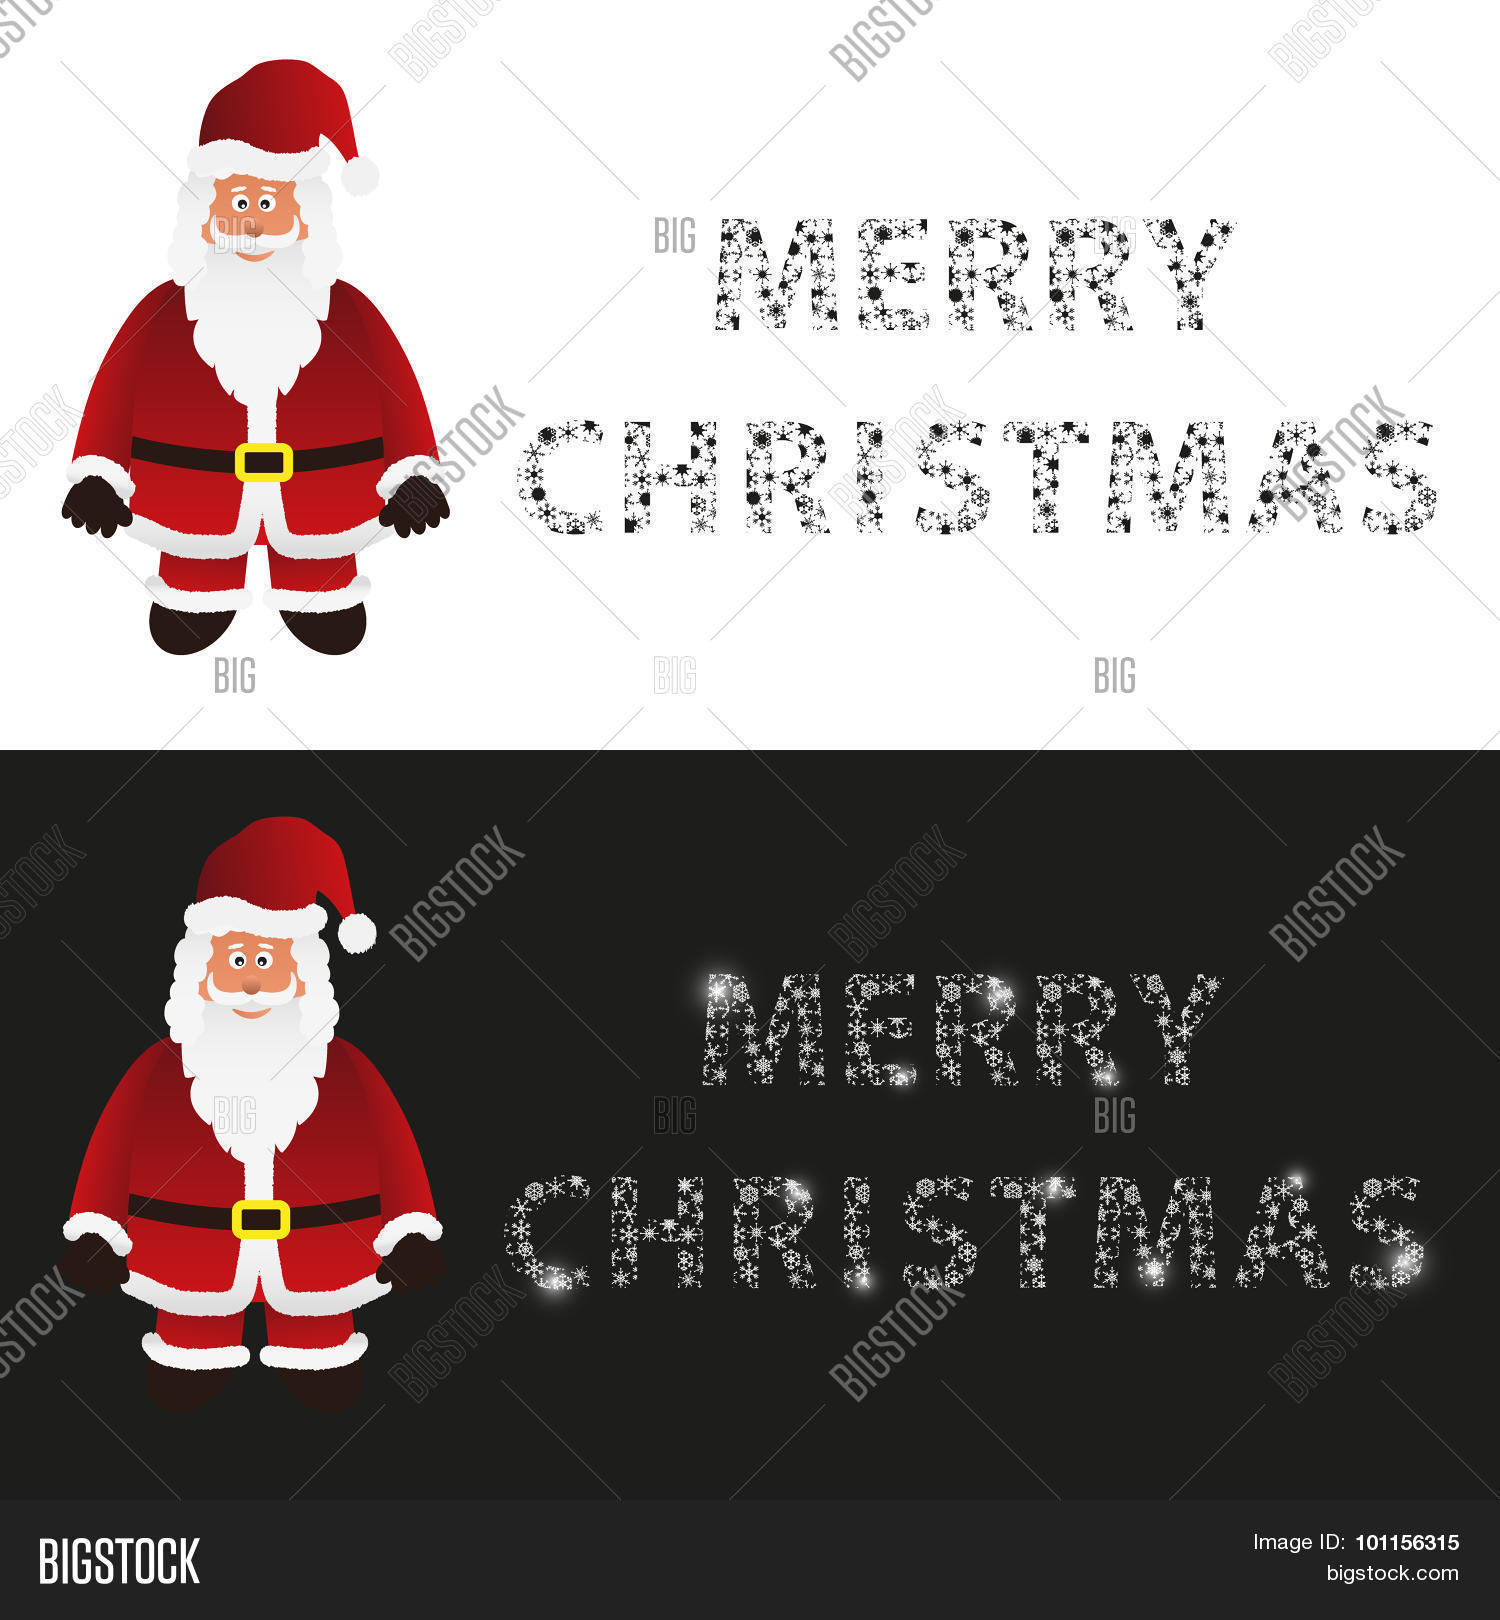 Mery Christmas Vector Photo Free Trial Bigstock